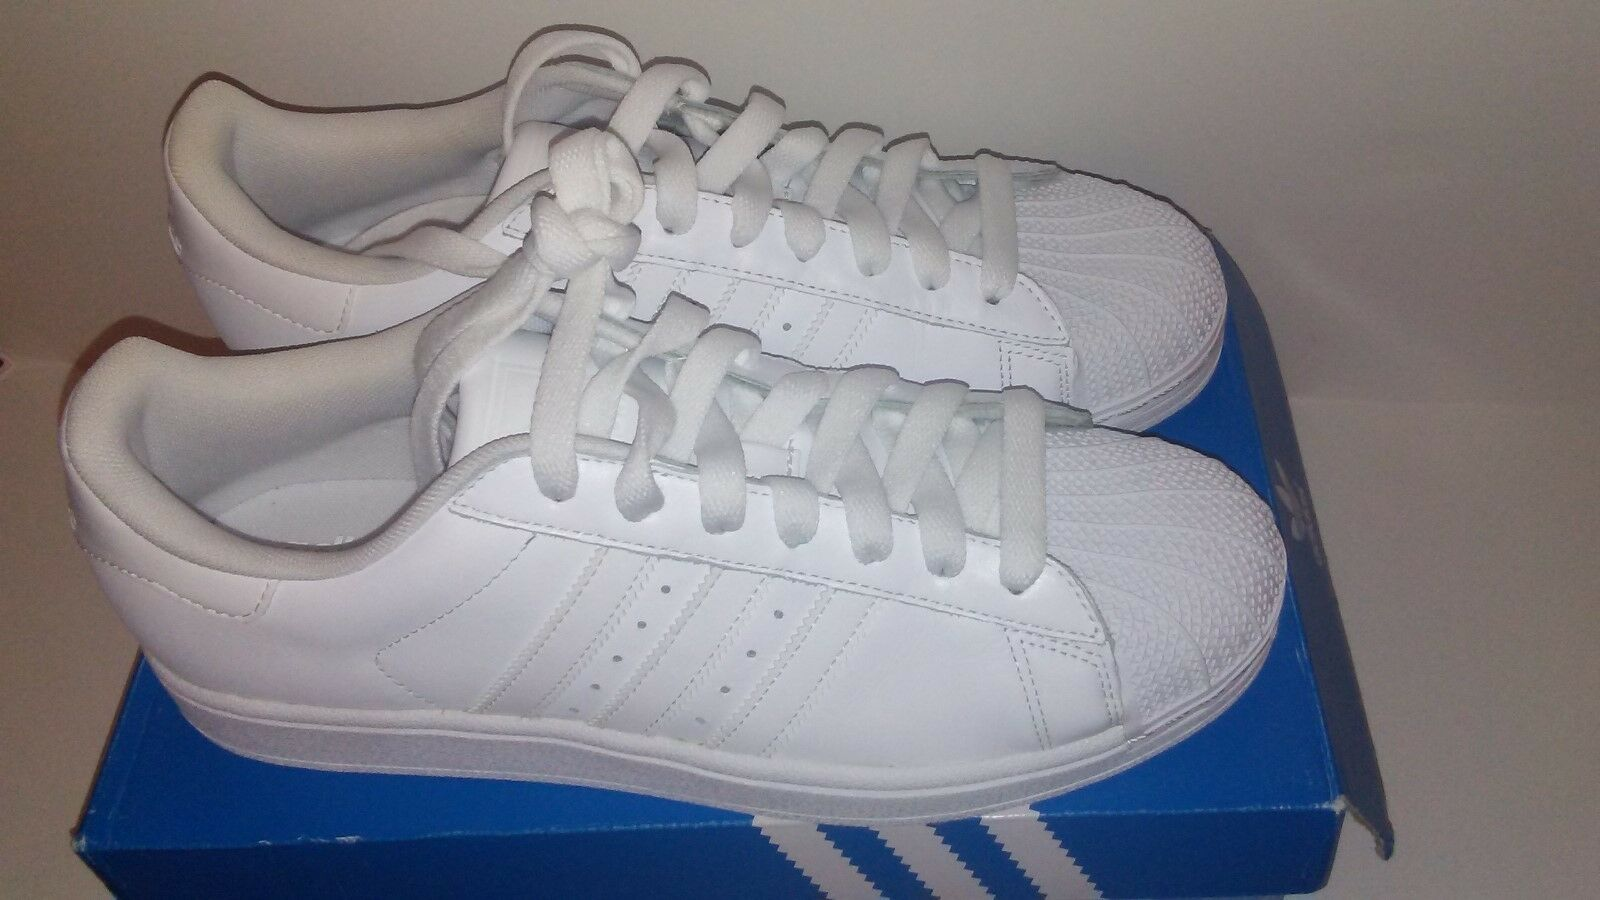 Adidas Adidas Adidas superstar ii bianco Uomo shelltoes scarpe 10 4fc4c1